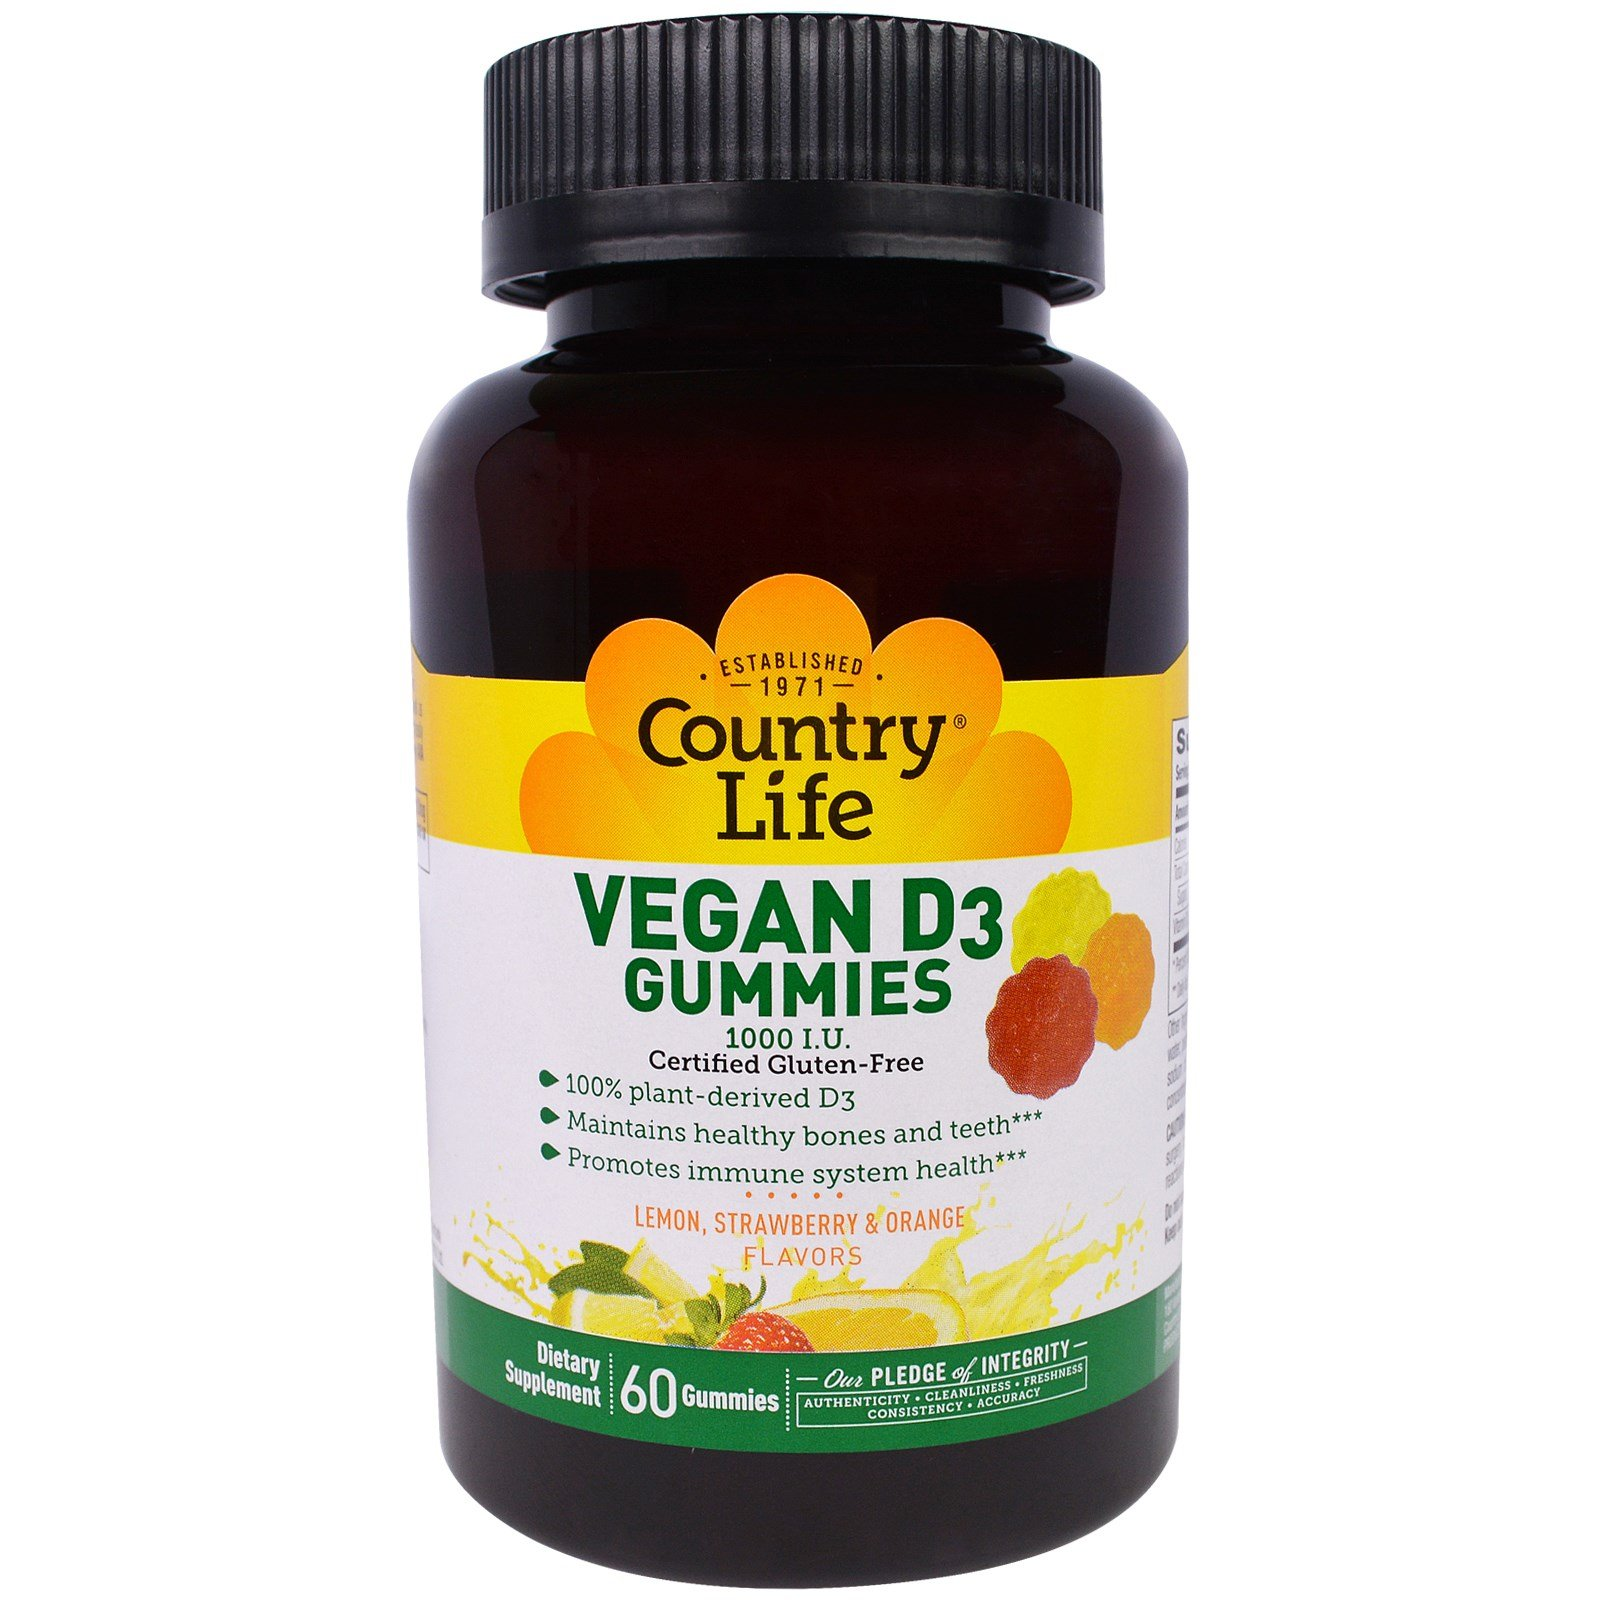 Country Life, Vegan D3 Gummies, Lemon, Strawberry & Orange Flavors, 1000 I.U, 60 Gummies